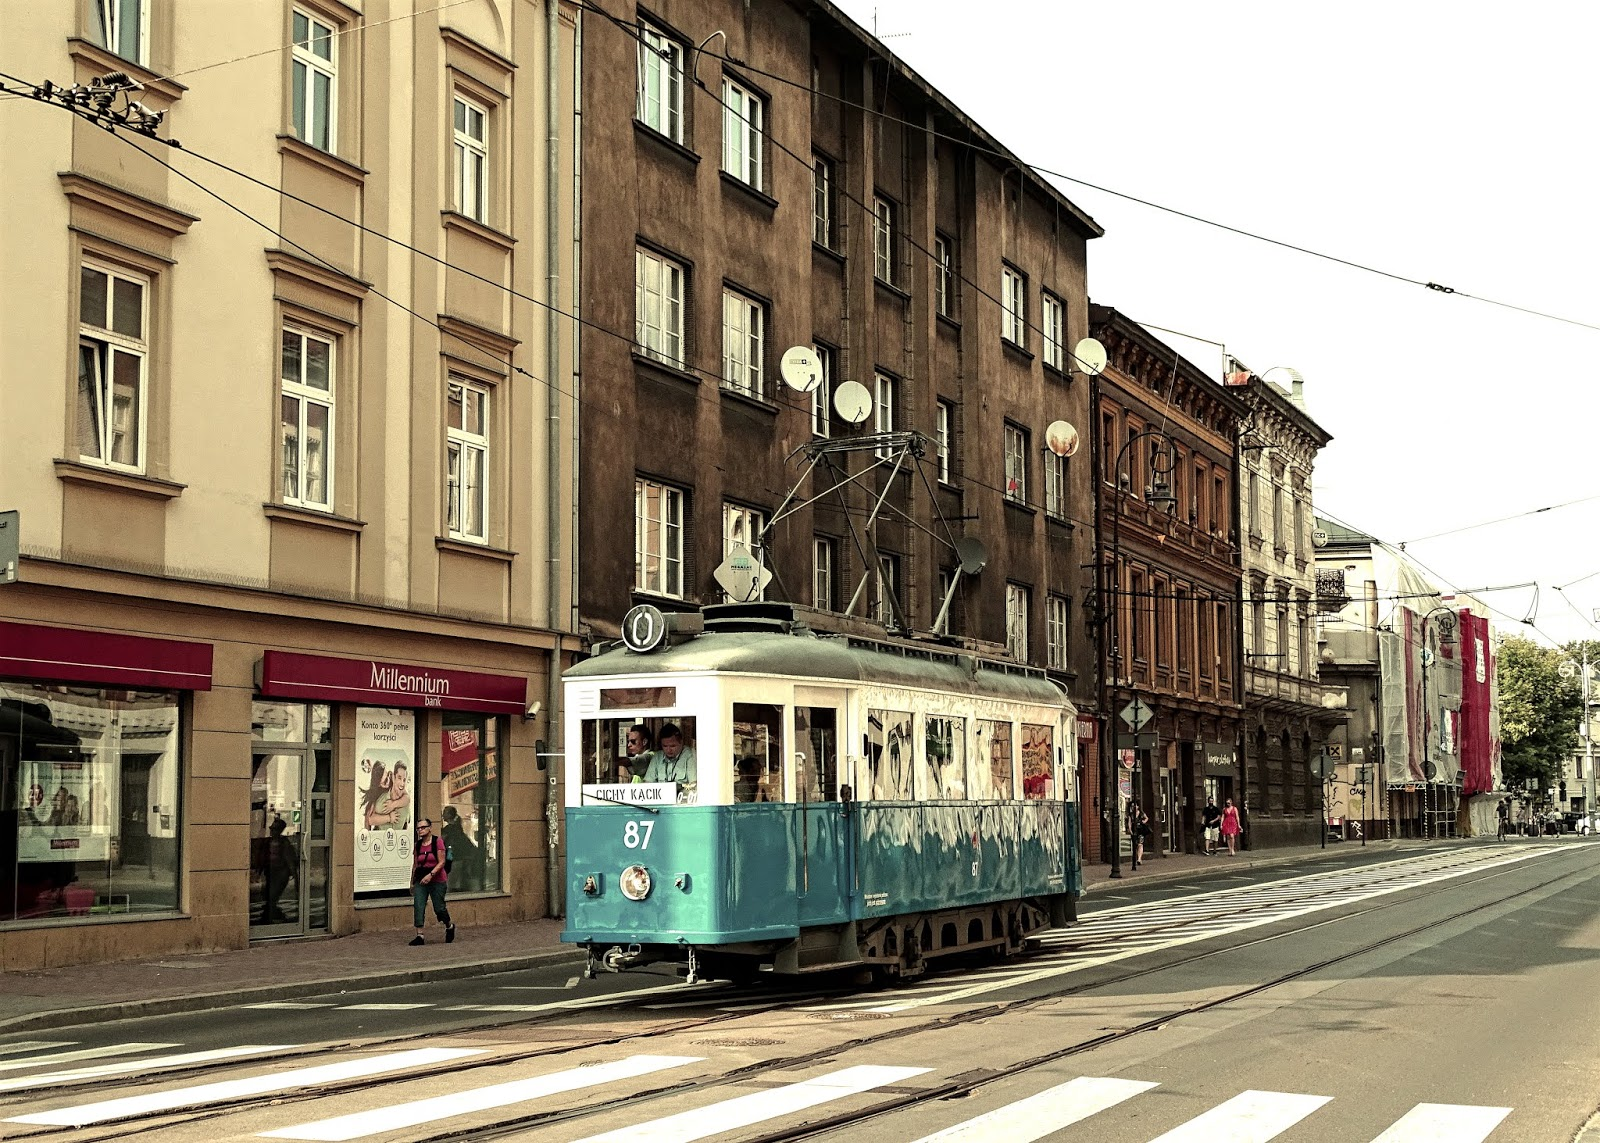 Stary krakowski tramwaj